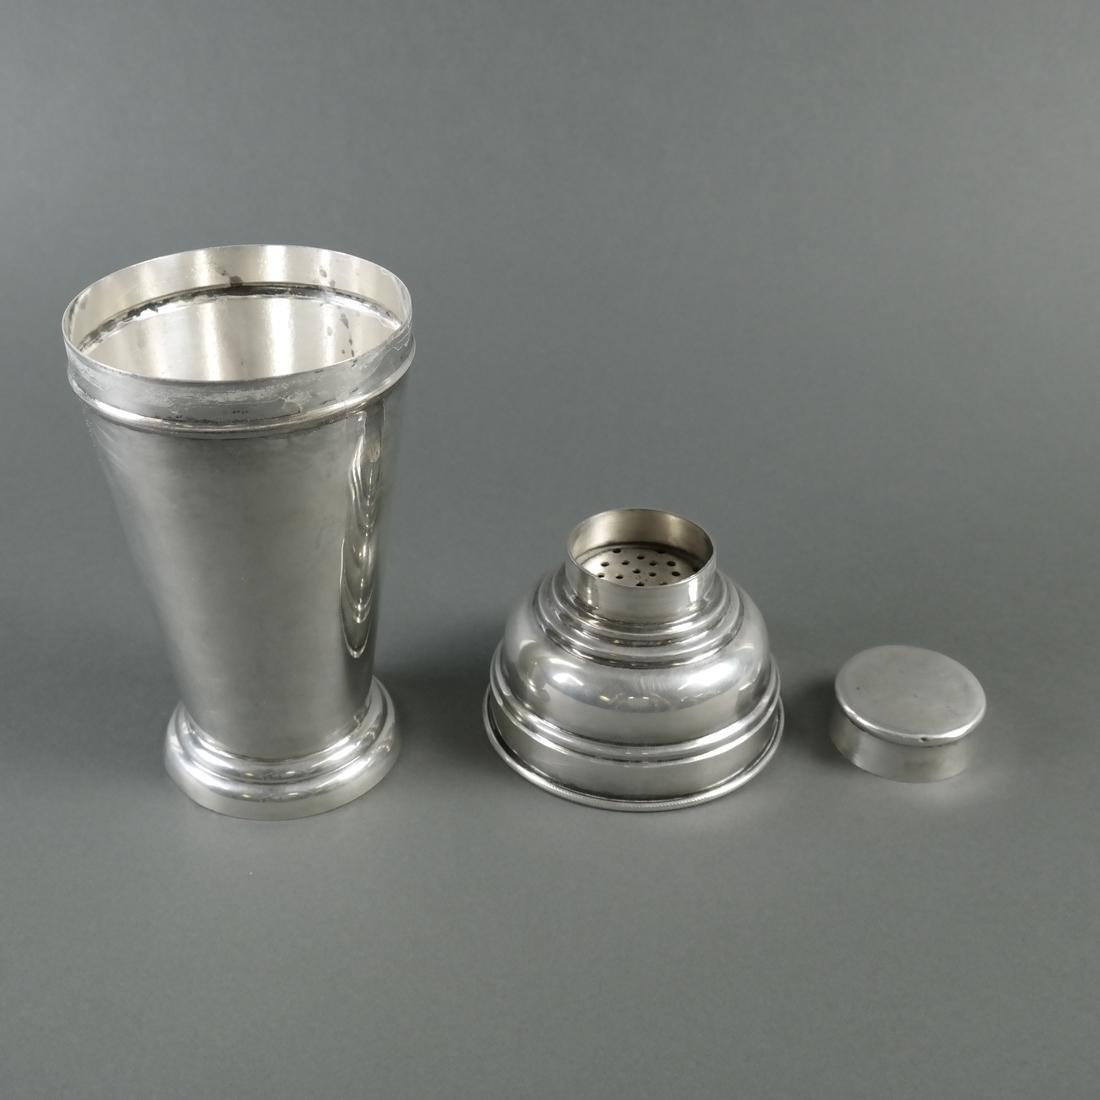 .900 Standard Silver Cocktail Shaker - 2